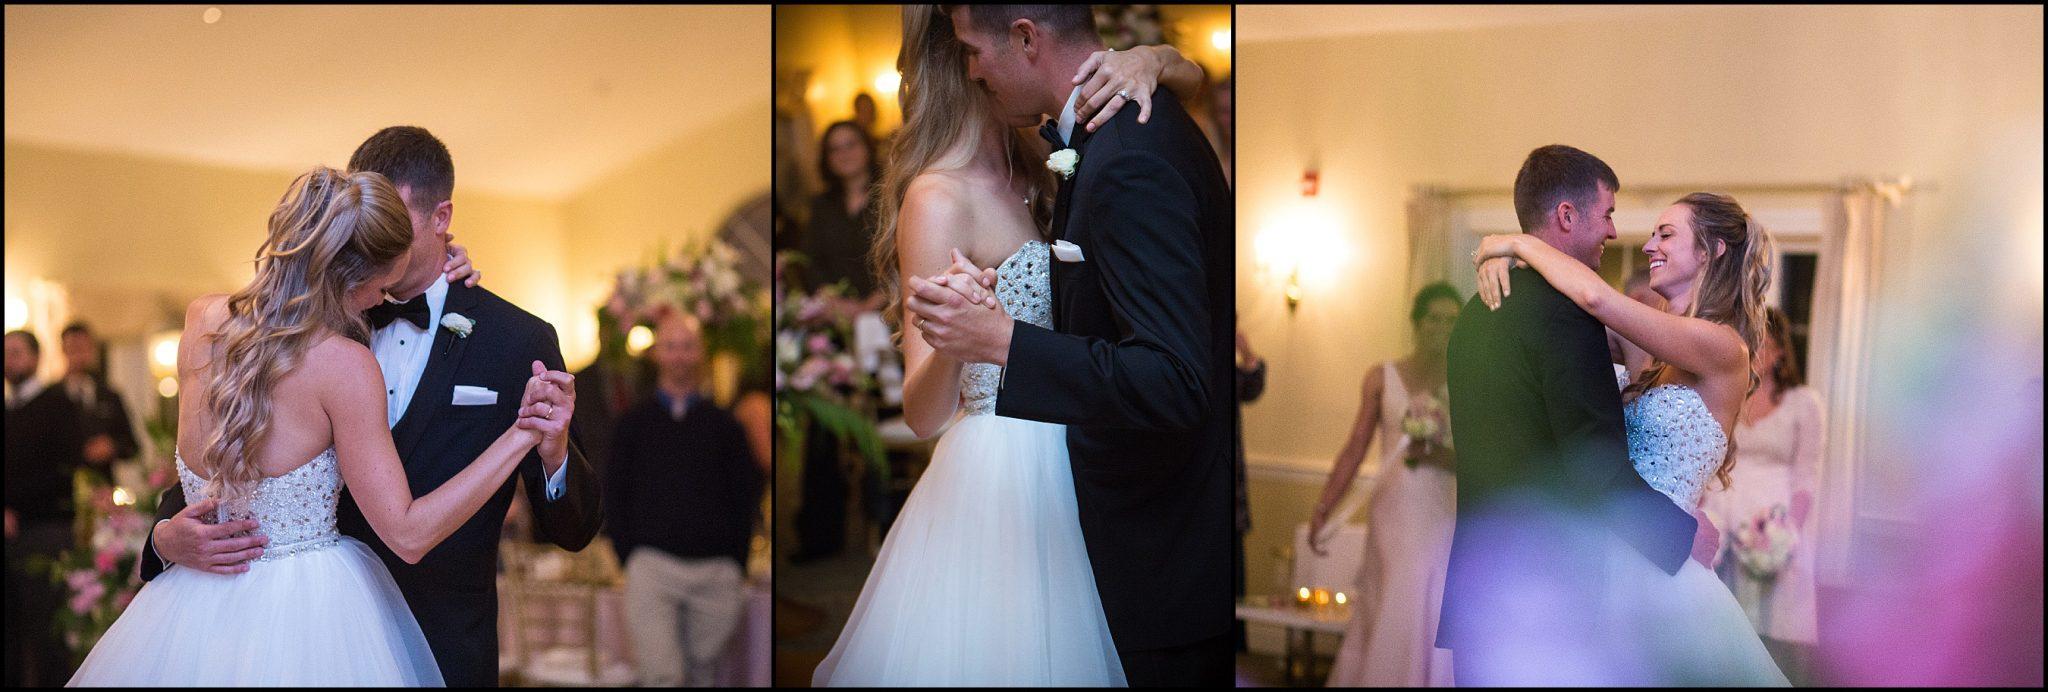 First Dance for wedding couple at Dunegrass Golf Club wedding